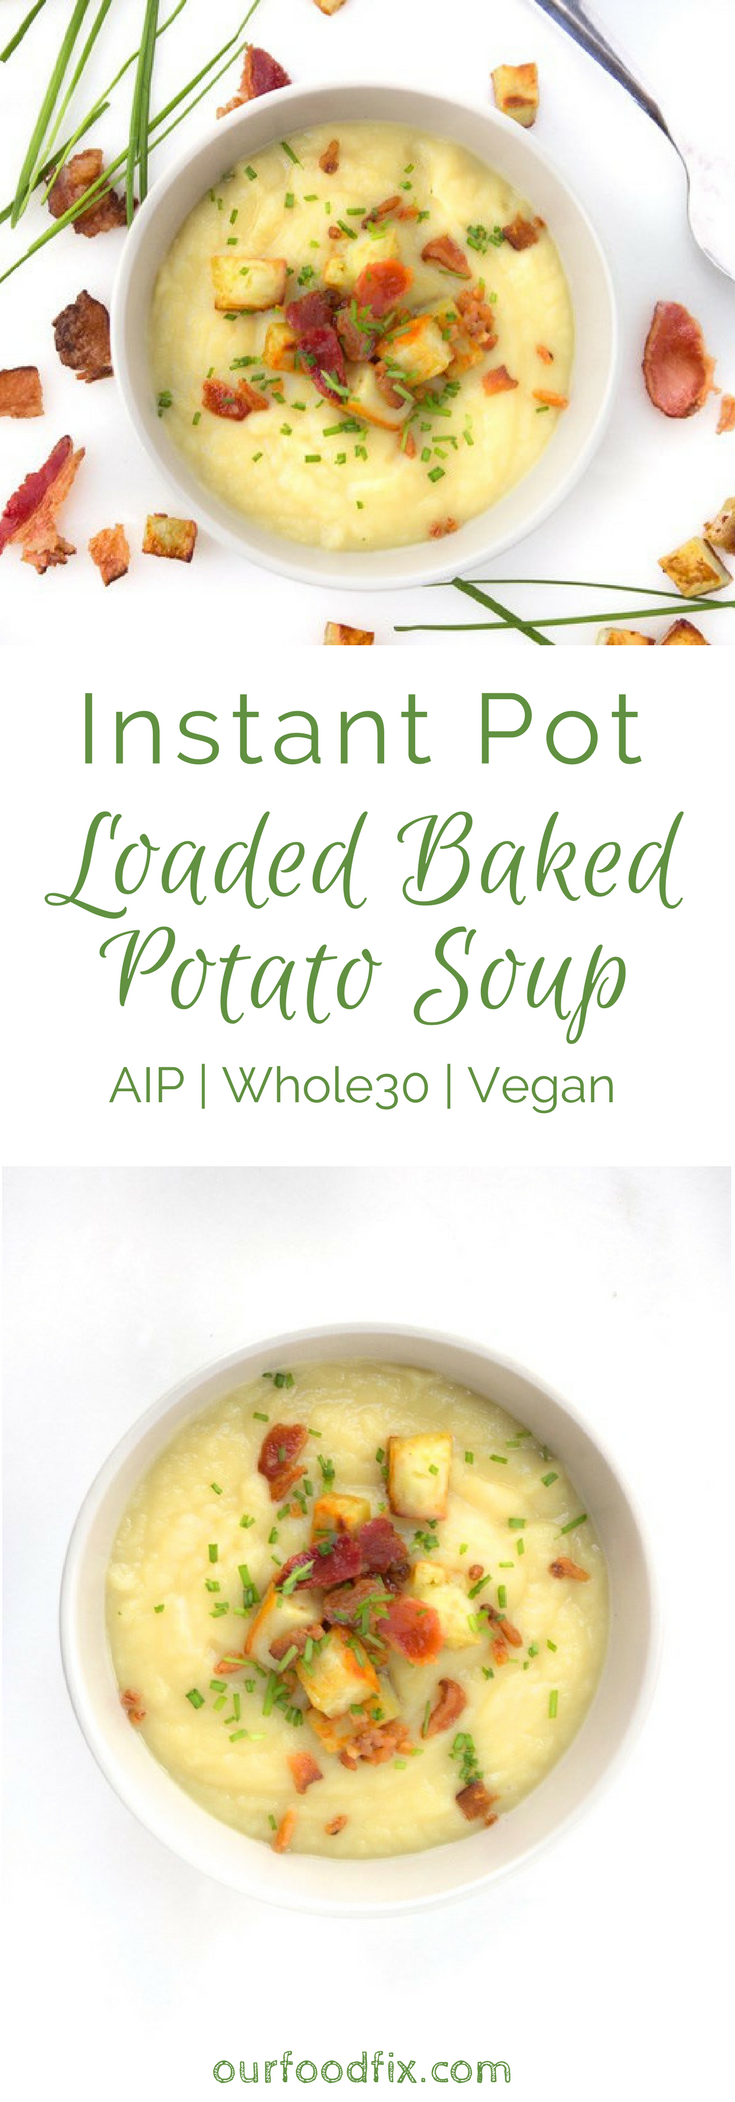 Instant Pot Loaded Baked Potato Soup (AIP, Whole30, Vegan) #easyonepotmeals